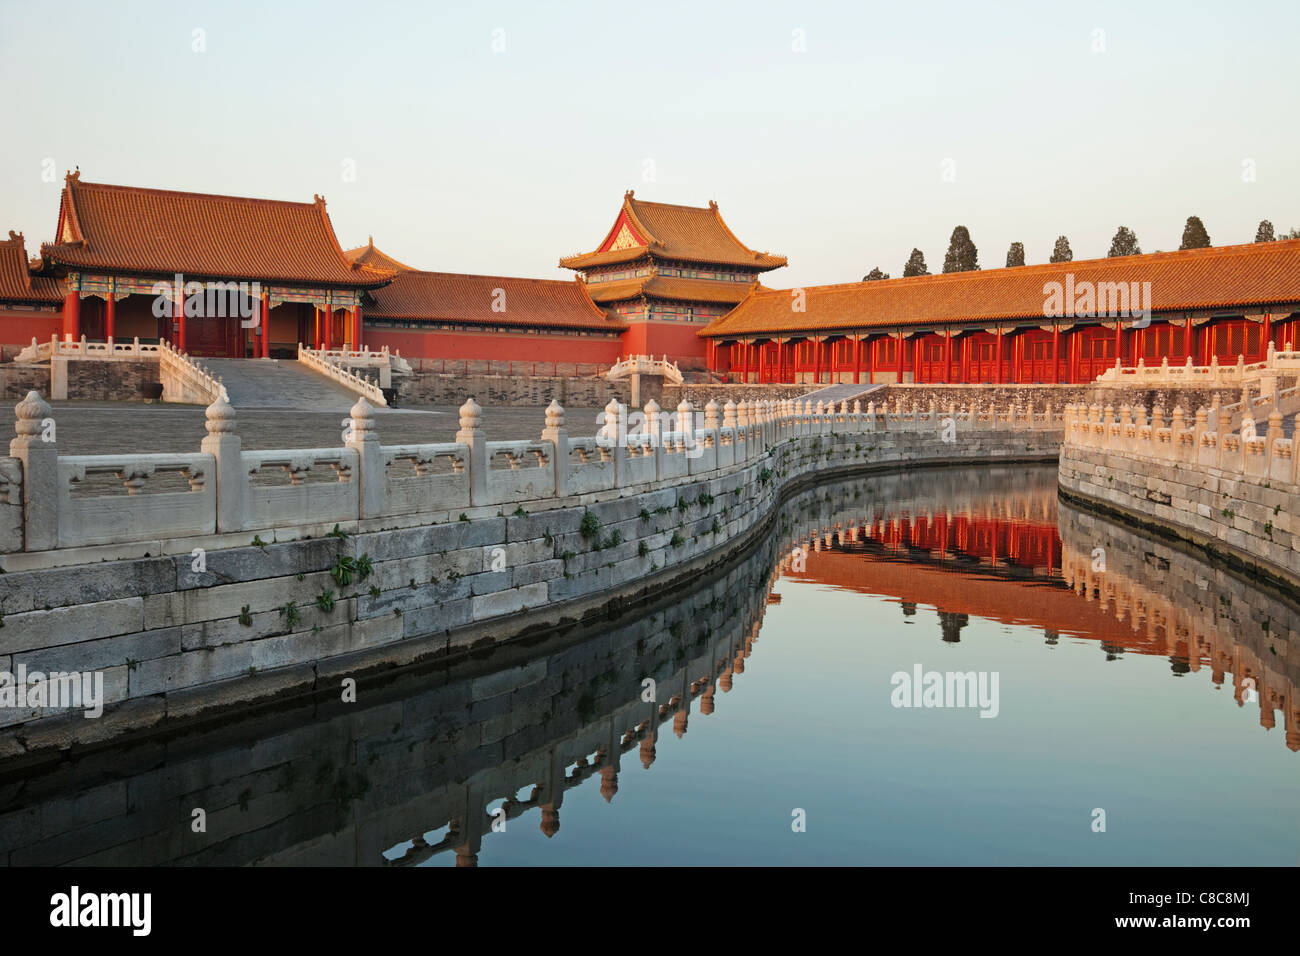 China, Beijing, Palace Museum or Forbidden City - Stock Image